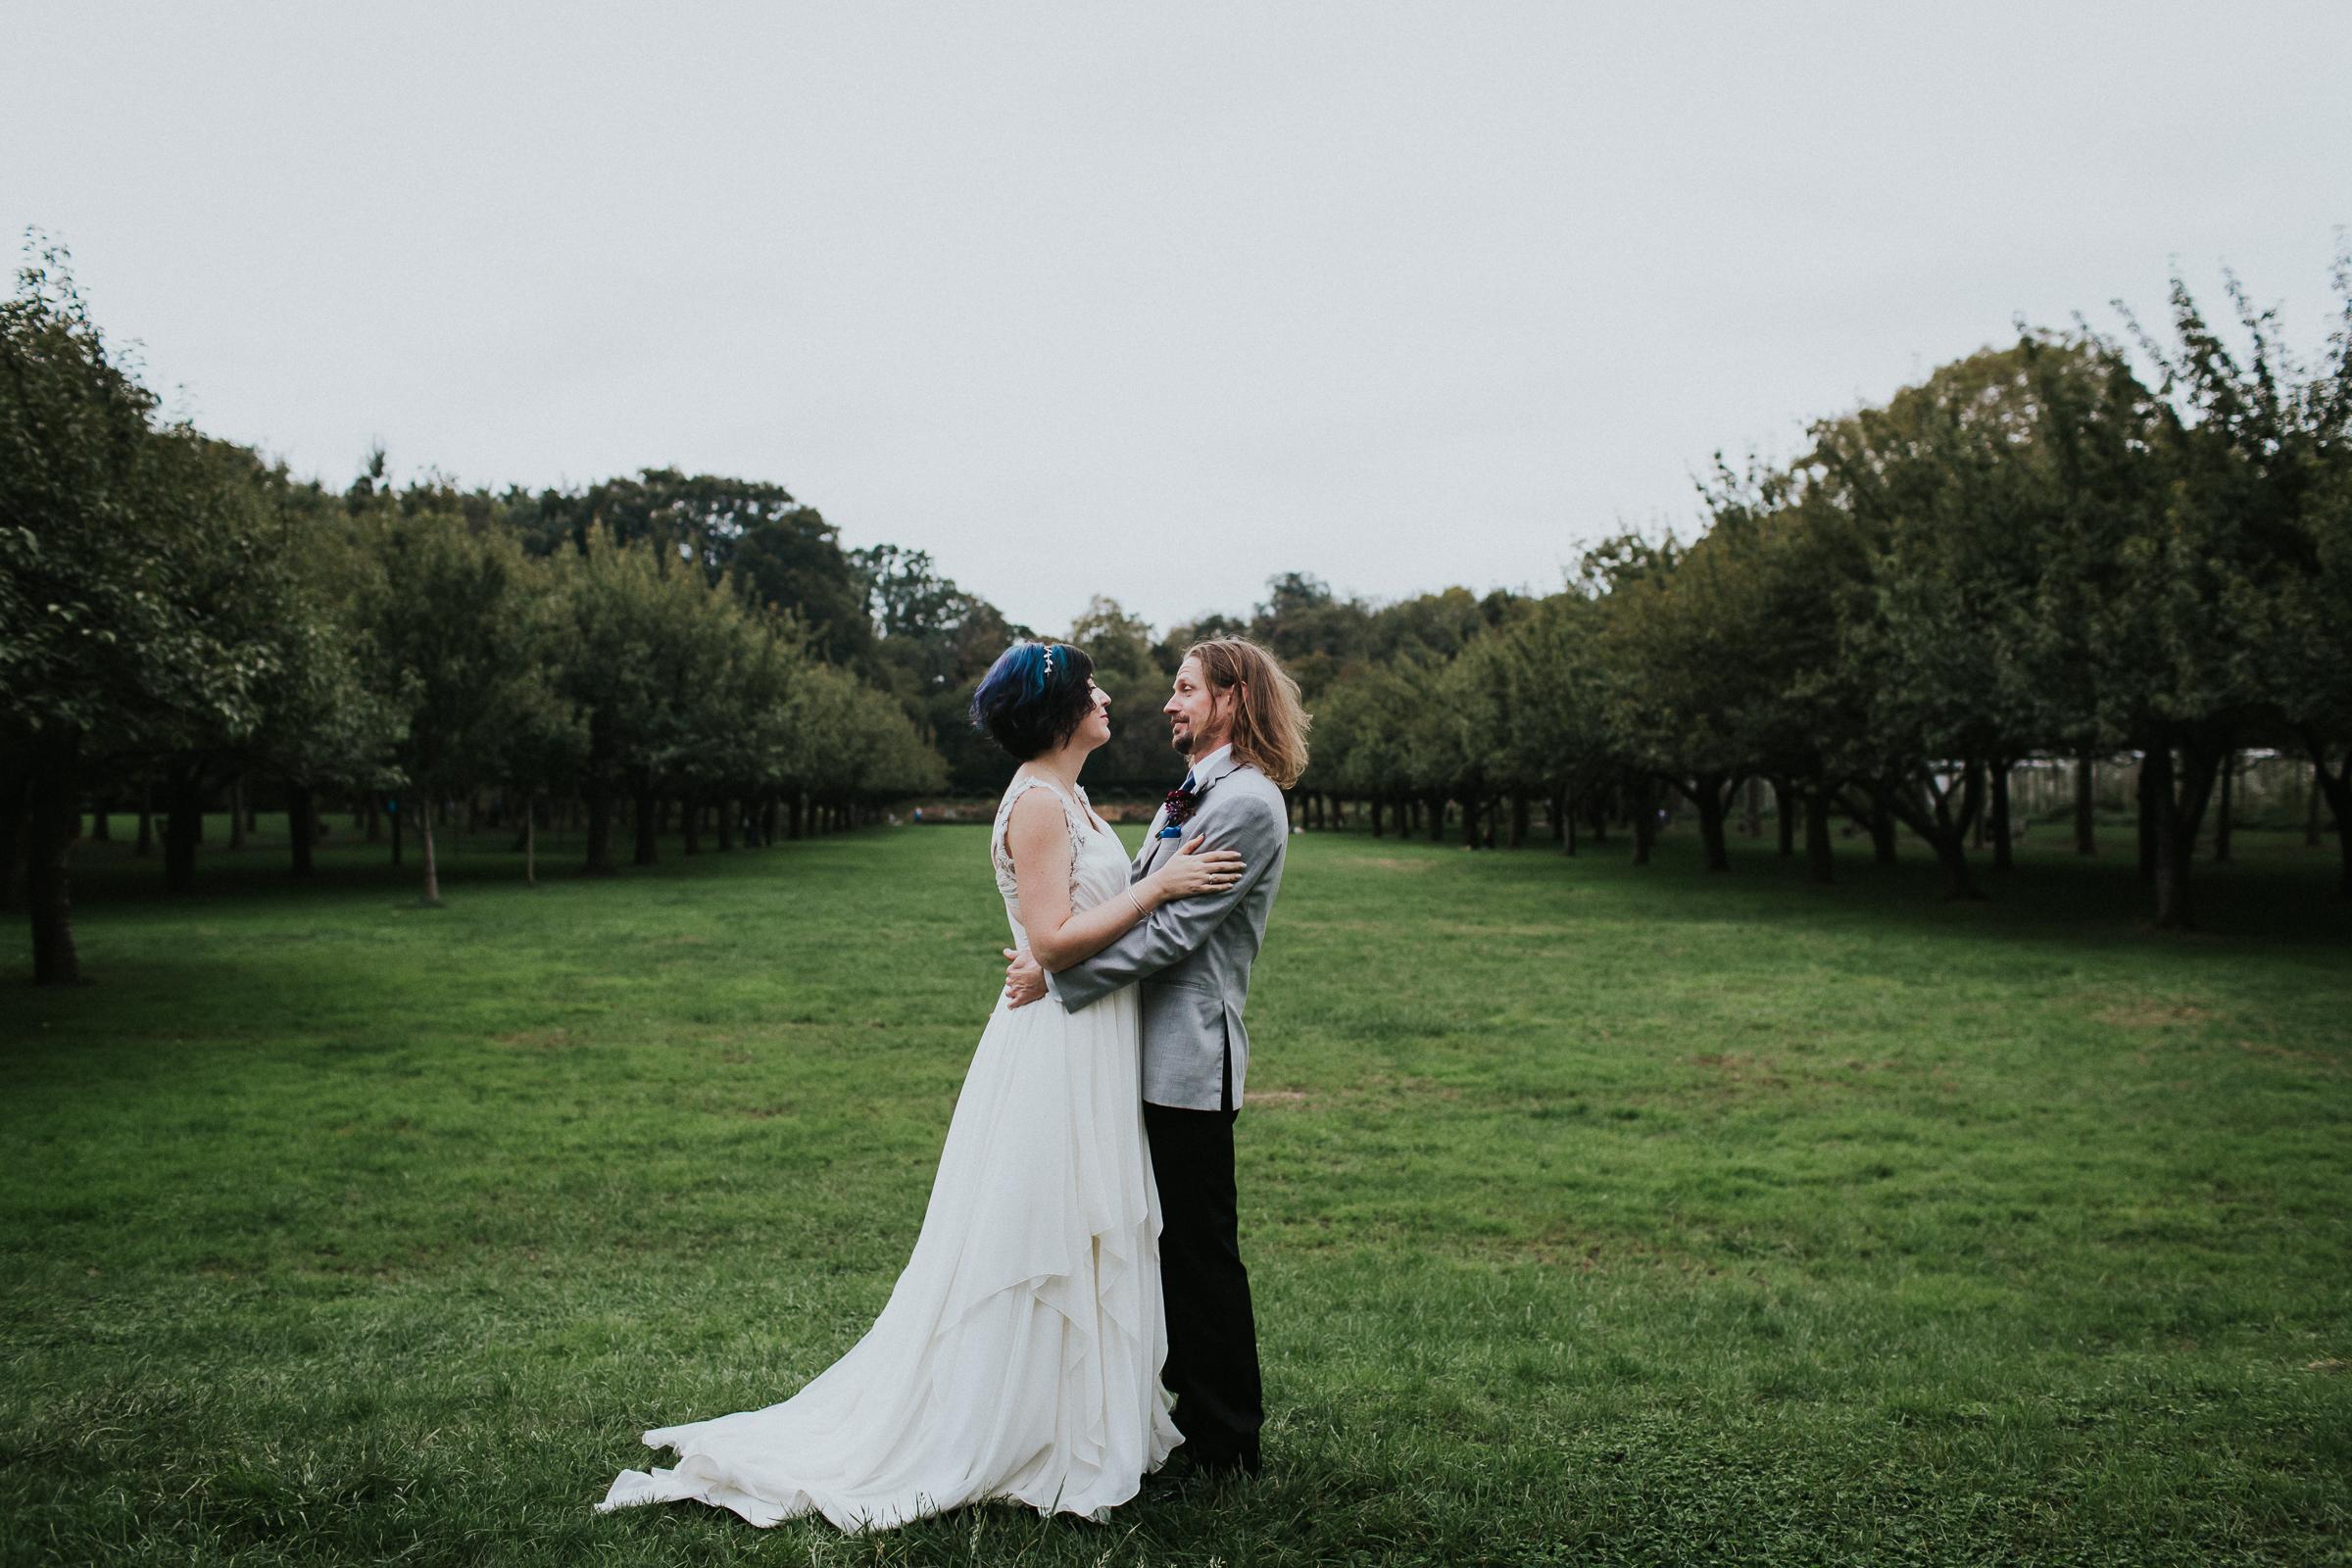 NYC-Brooklyn-Hotel-1-Botanic-Garden-Documentary-Wedding-Photographer-34.jpg